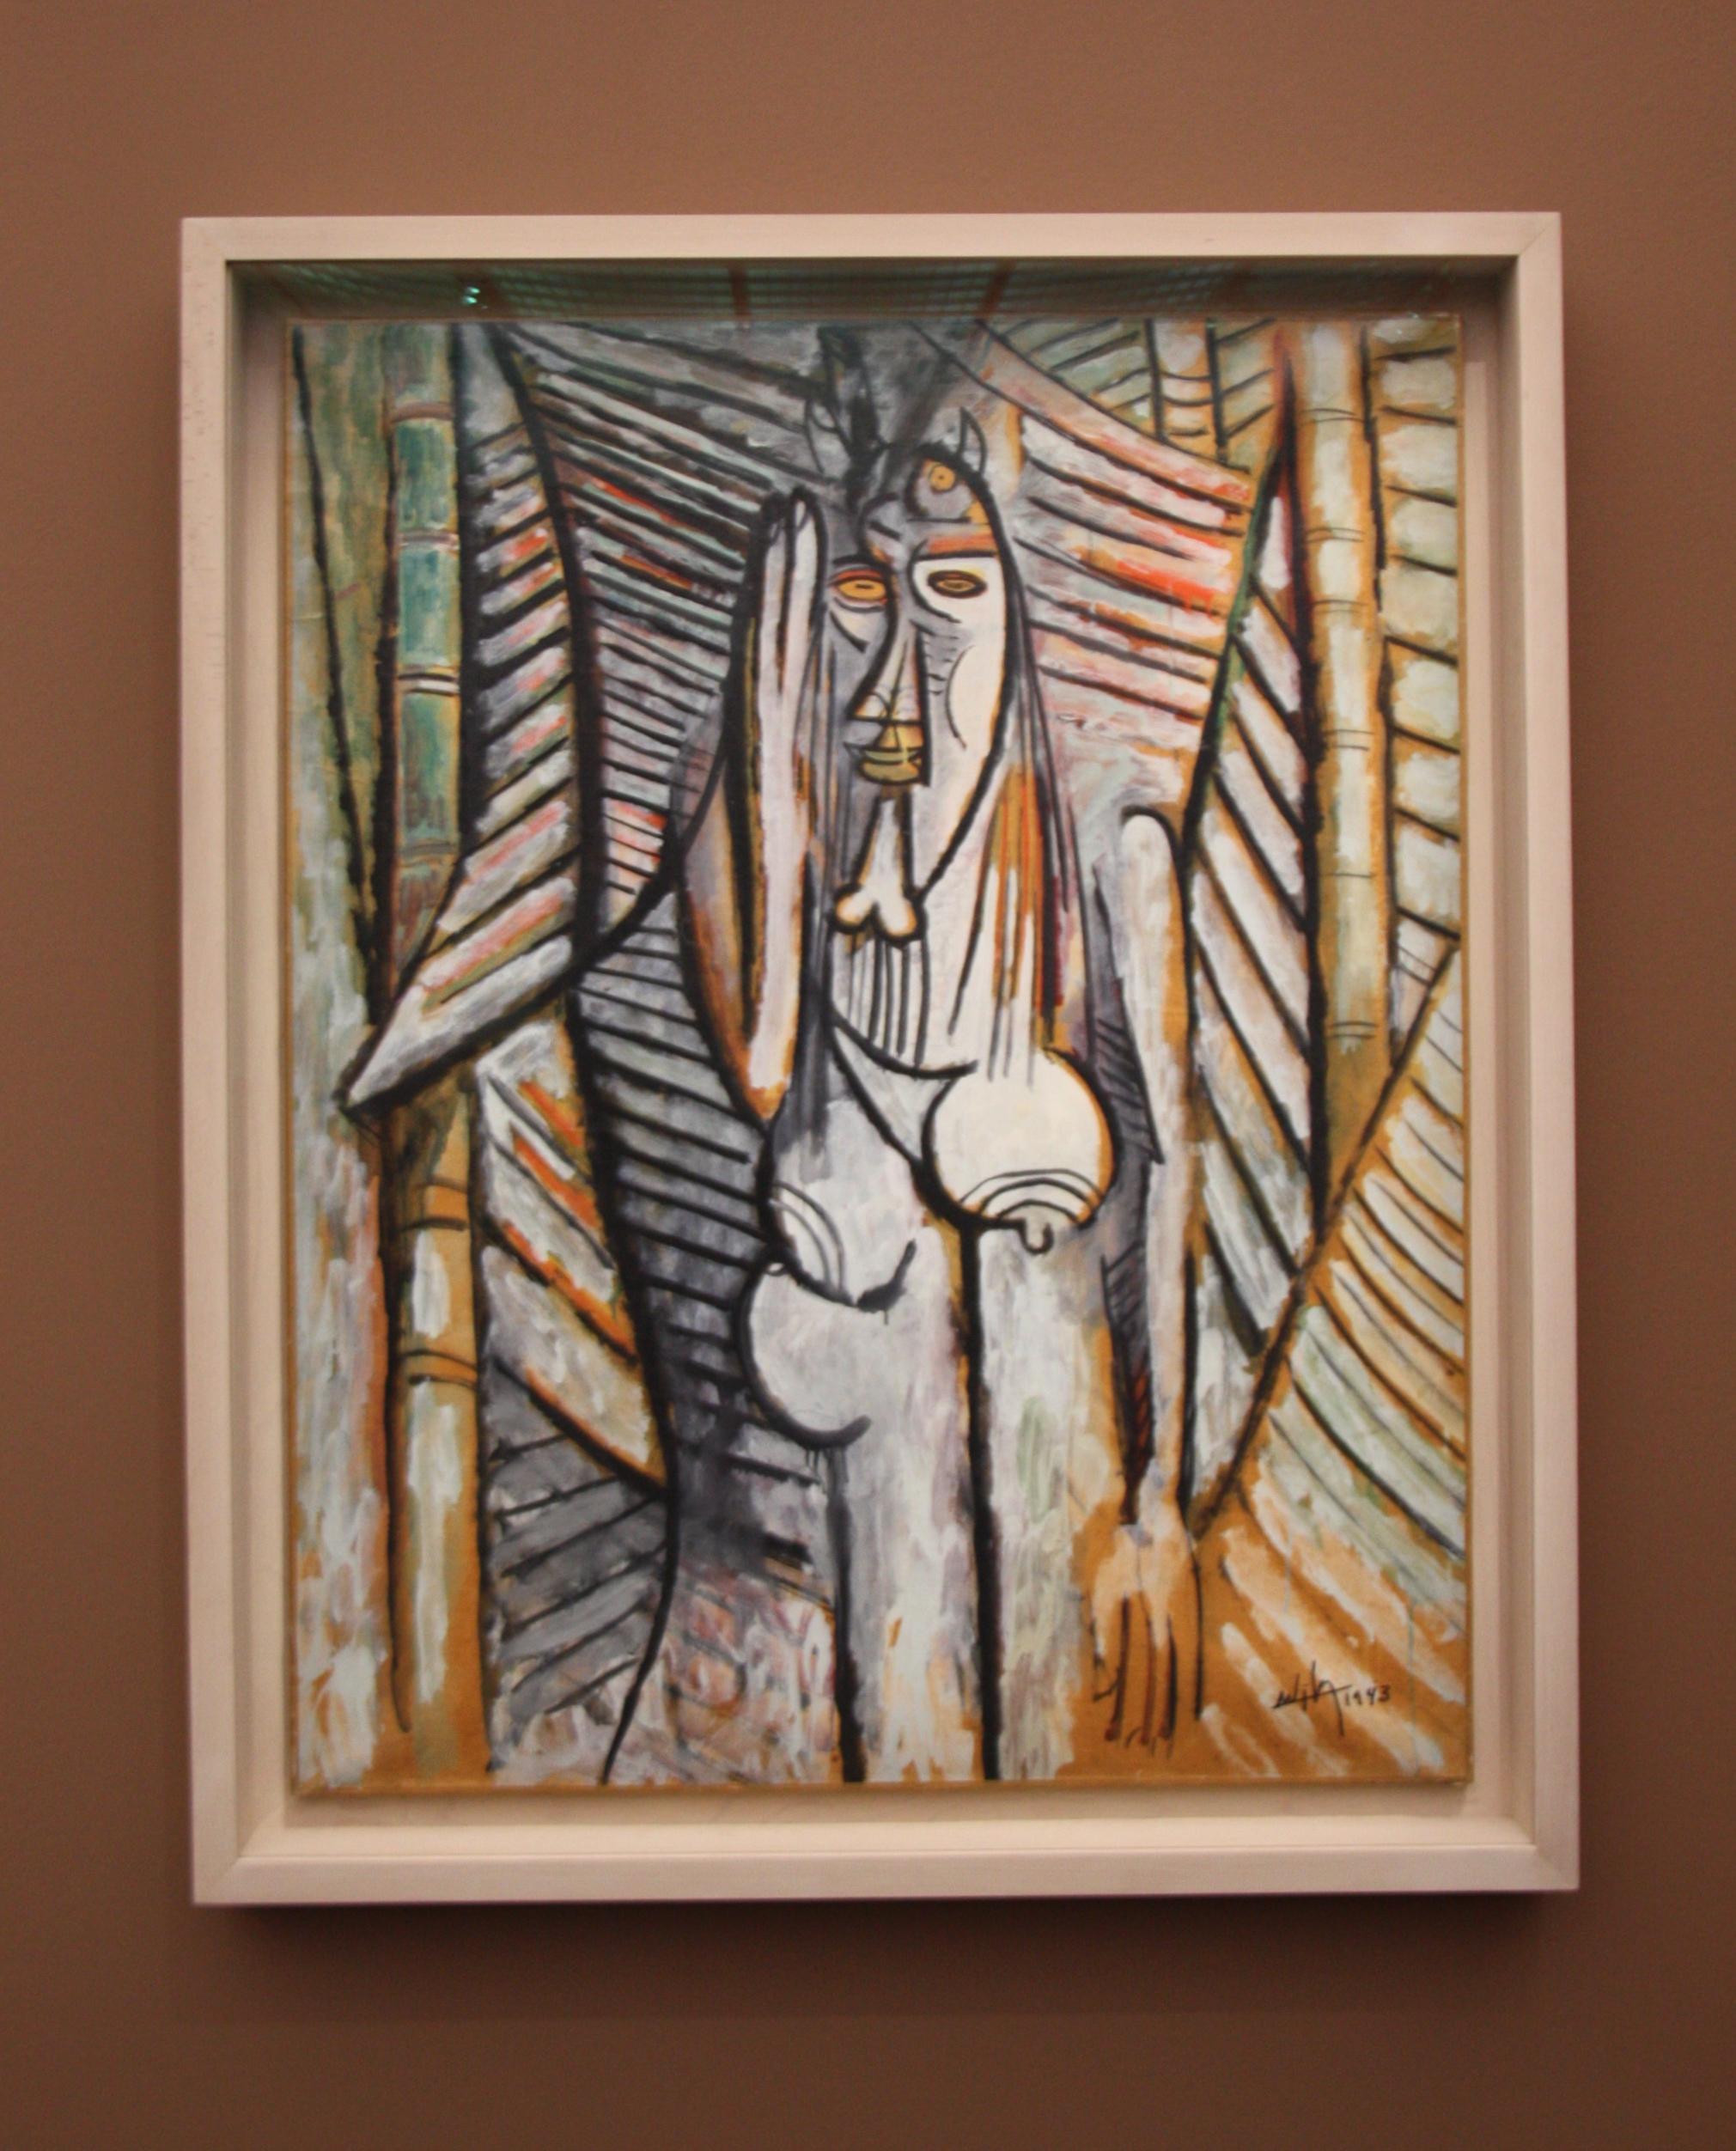 Wifredo Lam, le bruit, 1943, centre pompidou-metz, exposition leiris